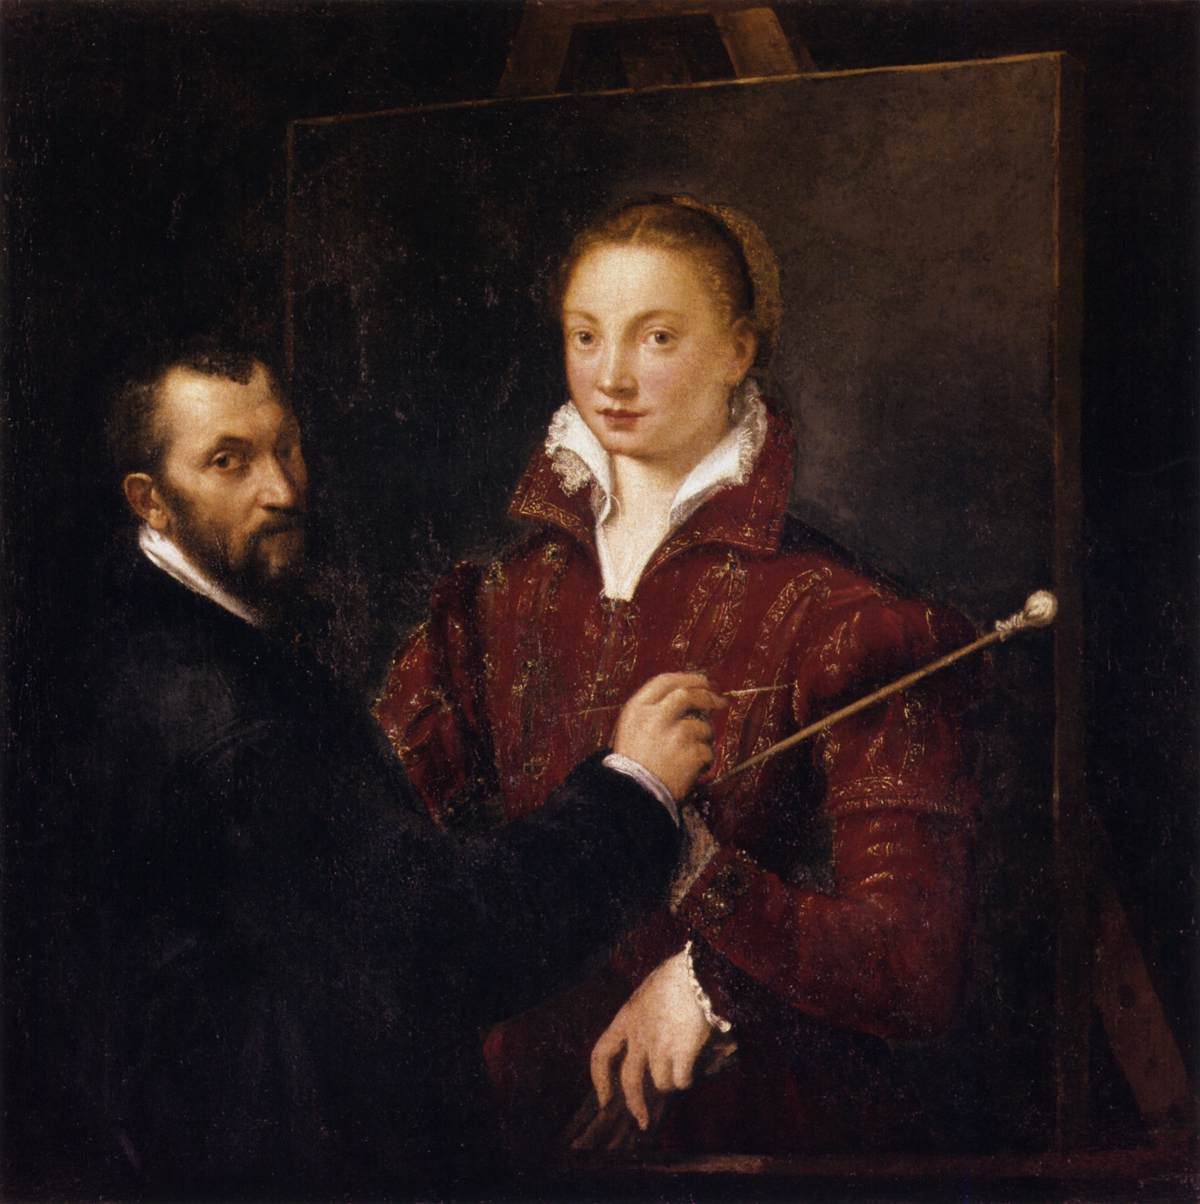 Sofonisba Anguissola portrait of Campi during restoration